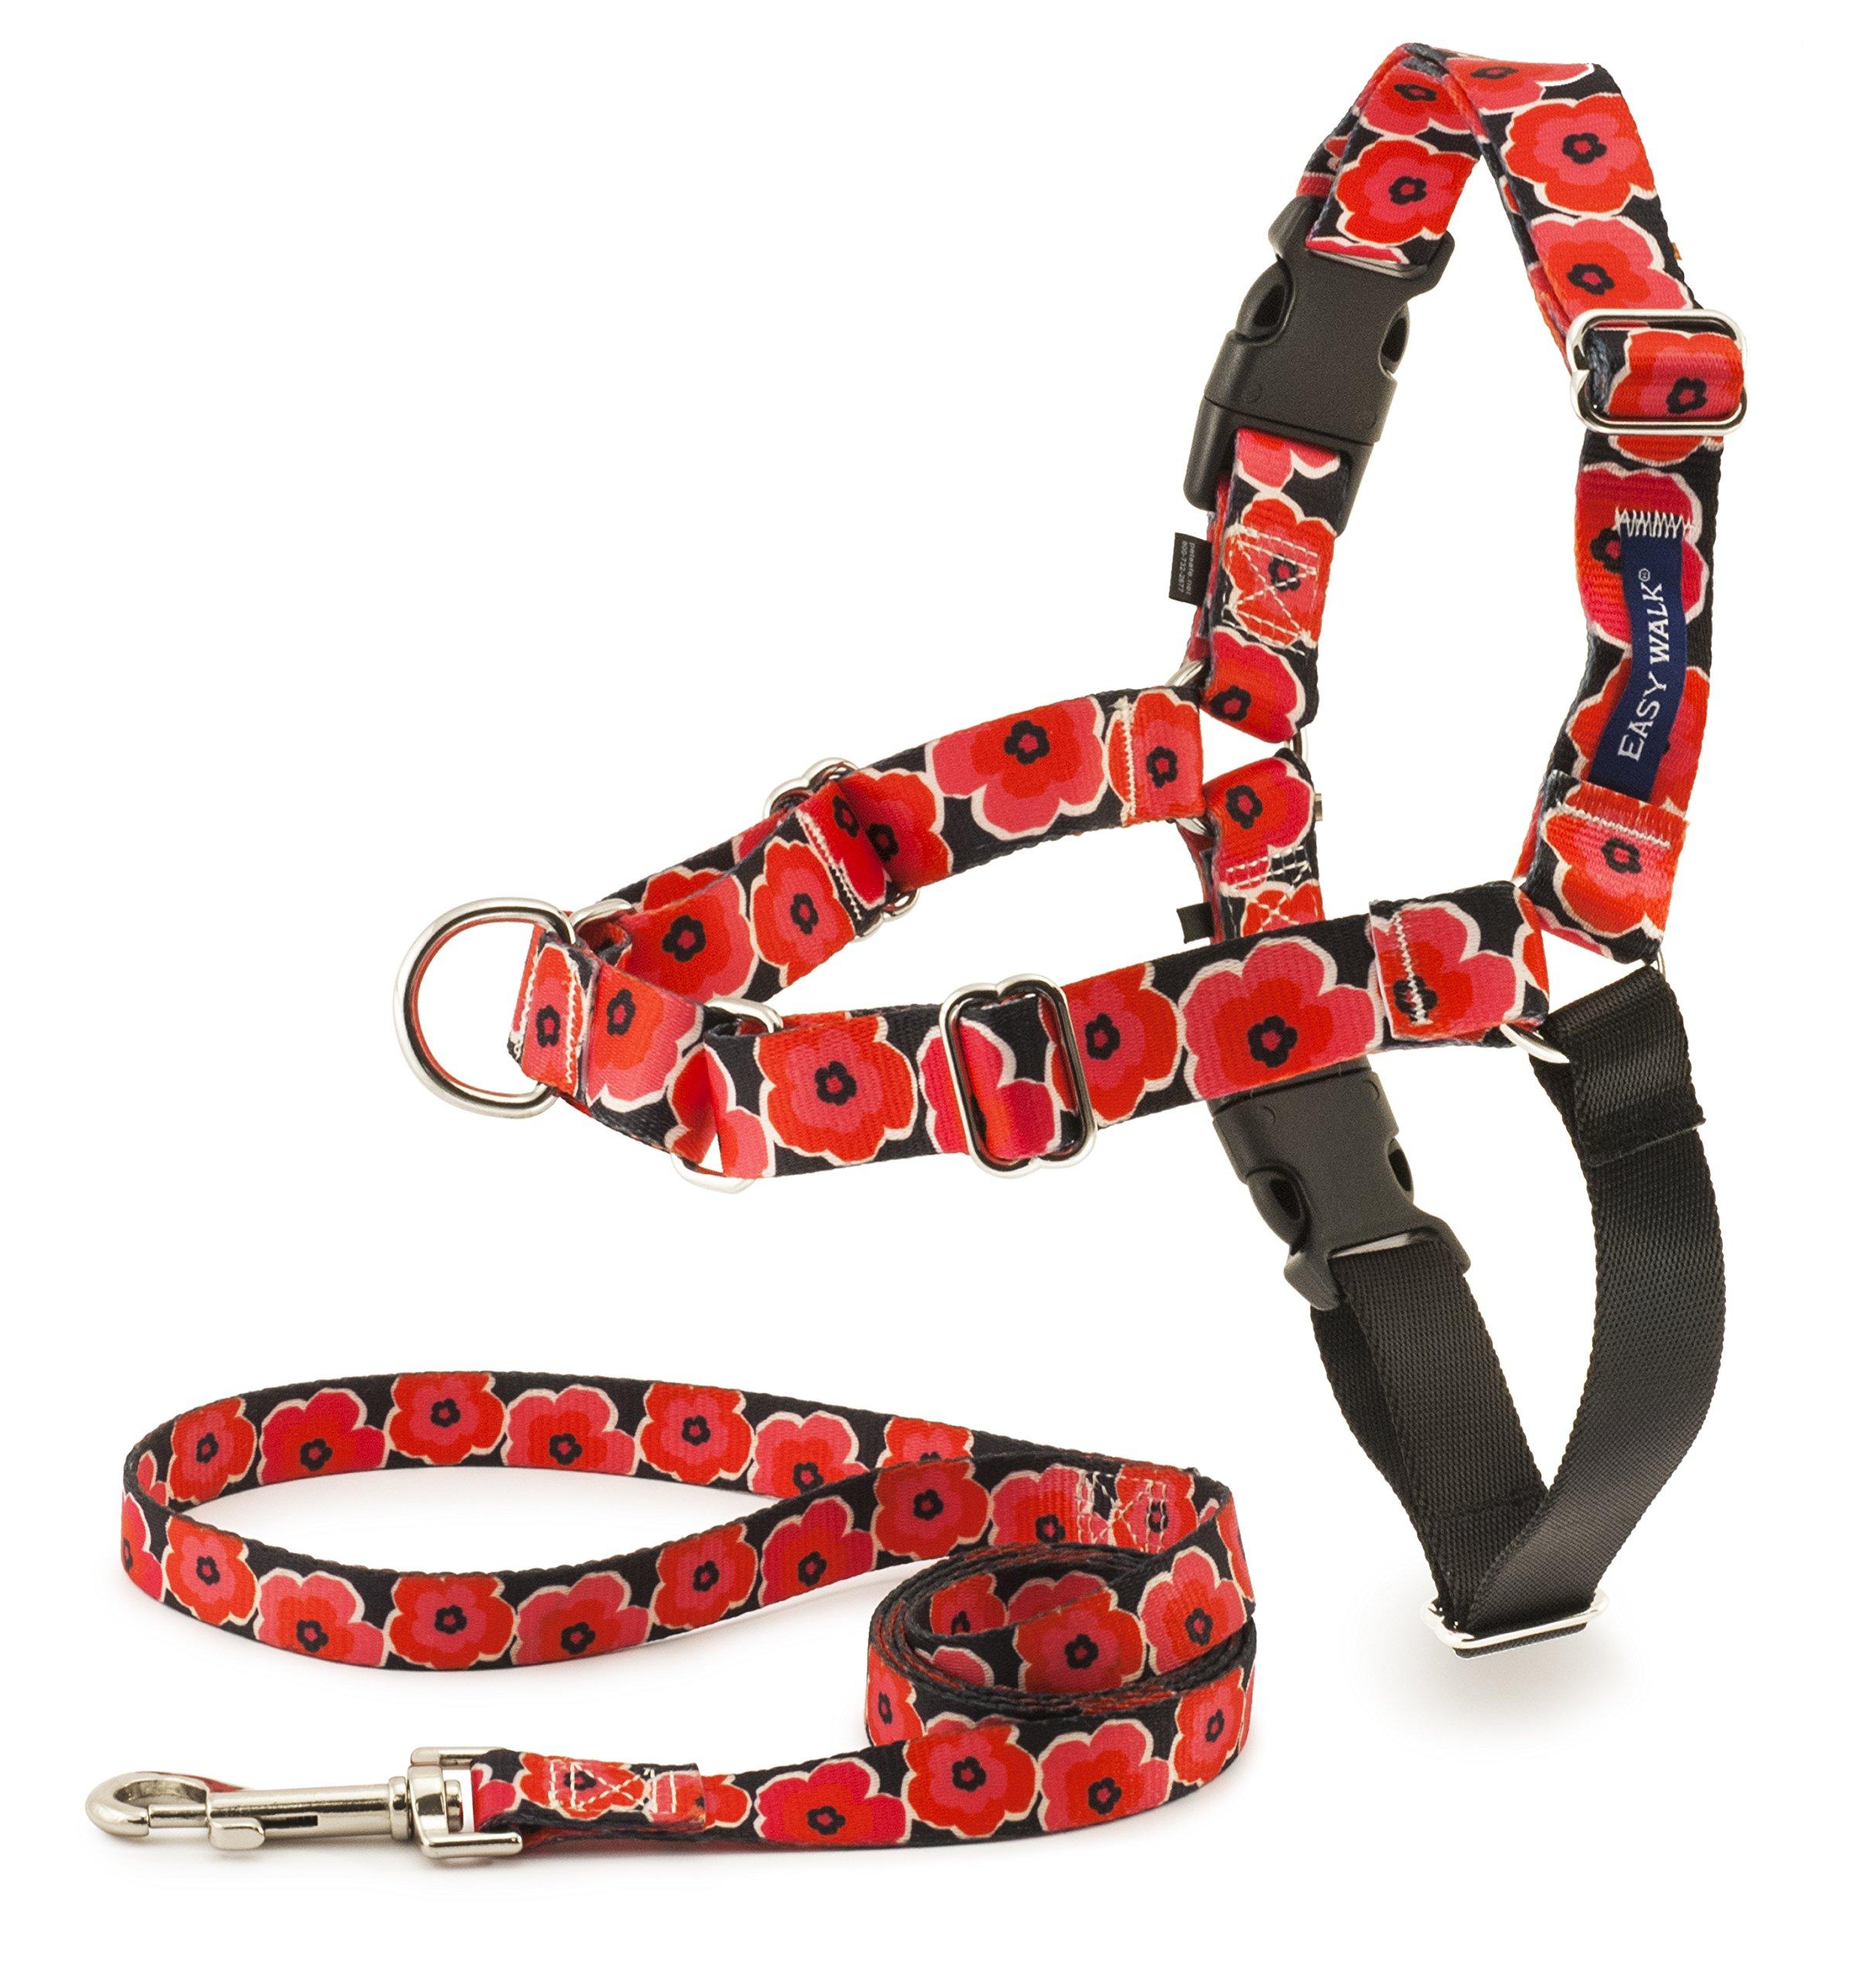 PetSafe EWH-C-HC-M-POP Easy Walk Chic Harness, Medium, Poppies